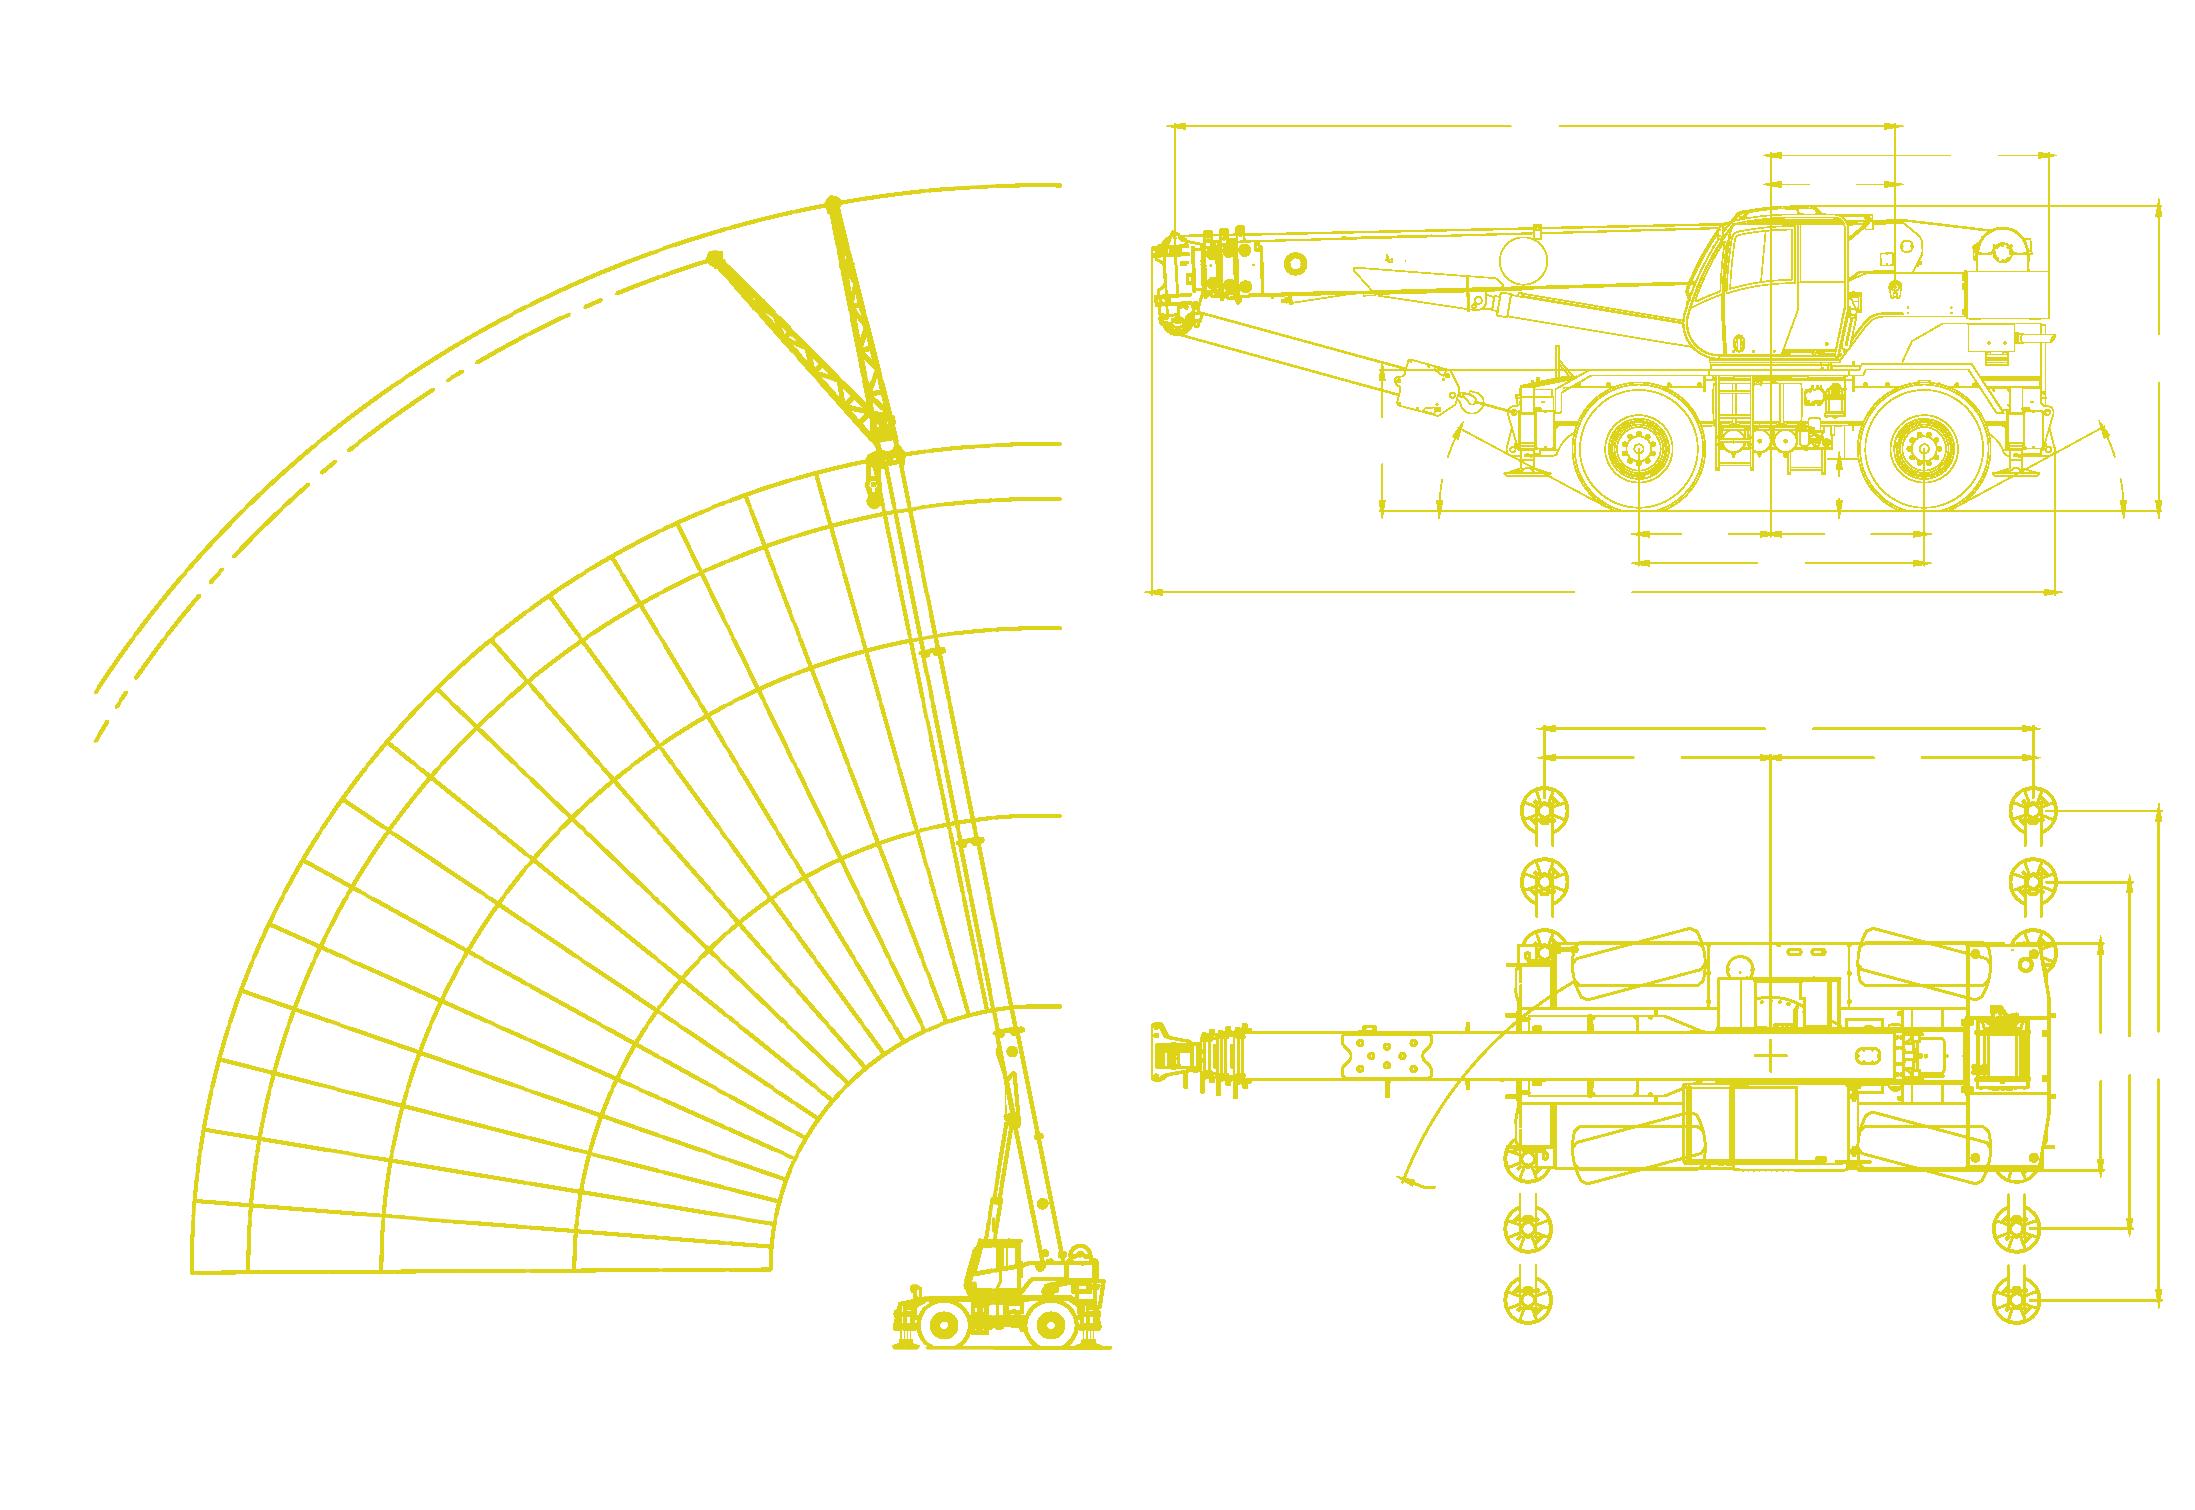 Locatelli - Gril 33.30 Working Envelope and Machine Diagrams